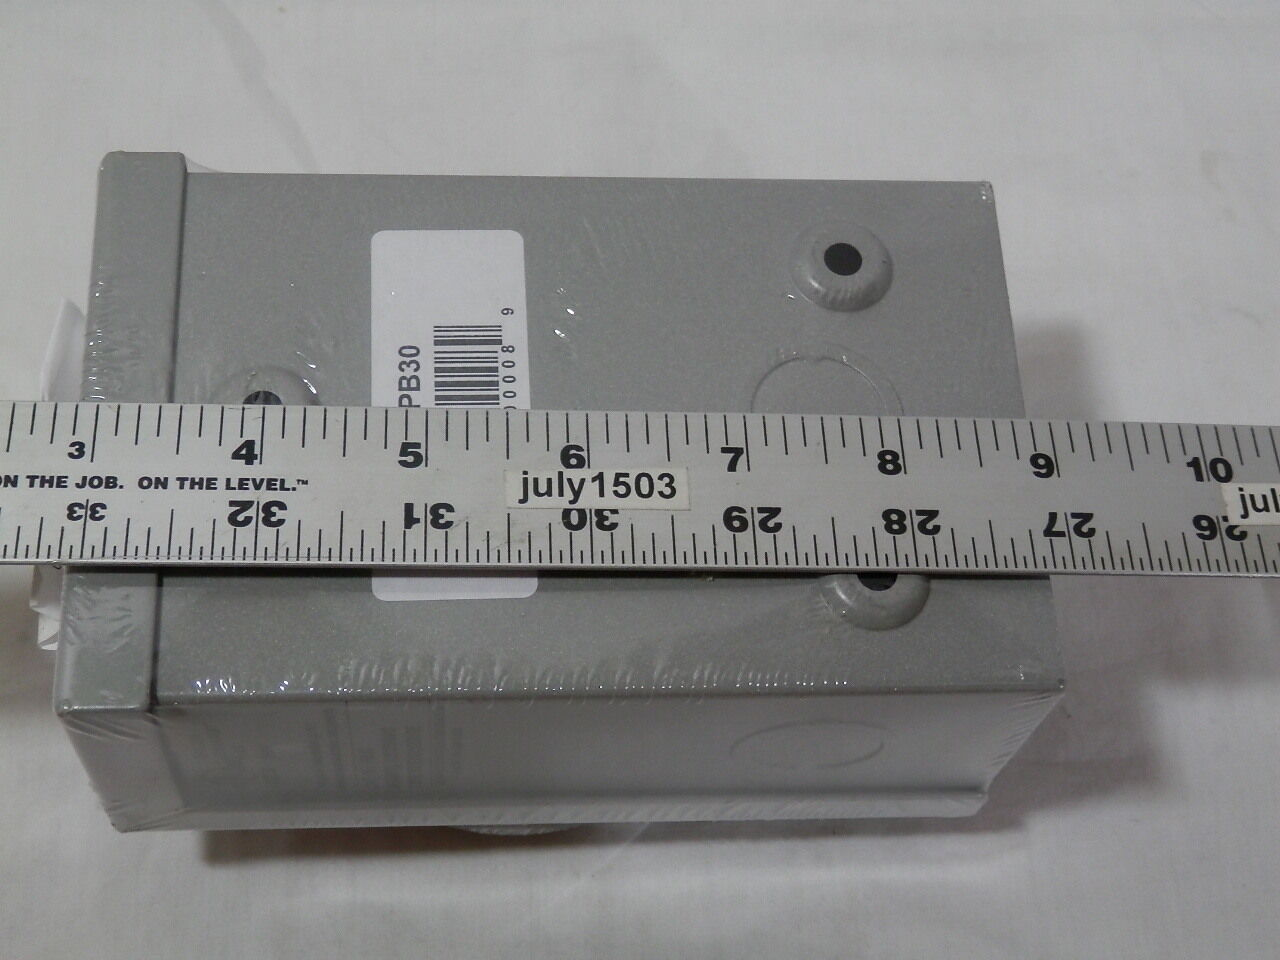 1 New Reliance Pb30 30 Amp Outdoor Power Inlet Box Metal L14 30p Controls L1430 Generator Cord Plug 3r 240 693829396982 Ebay